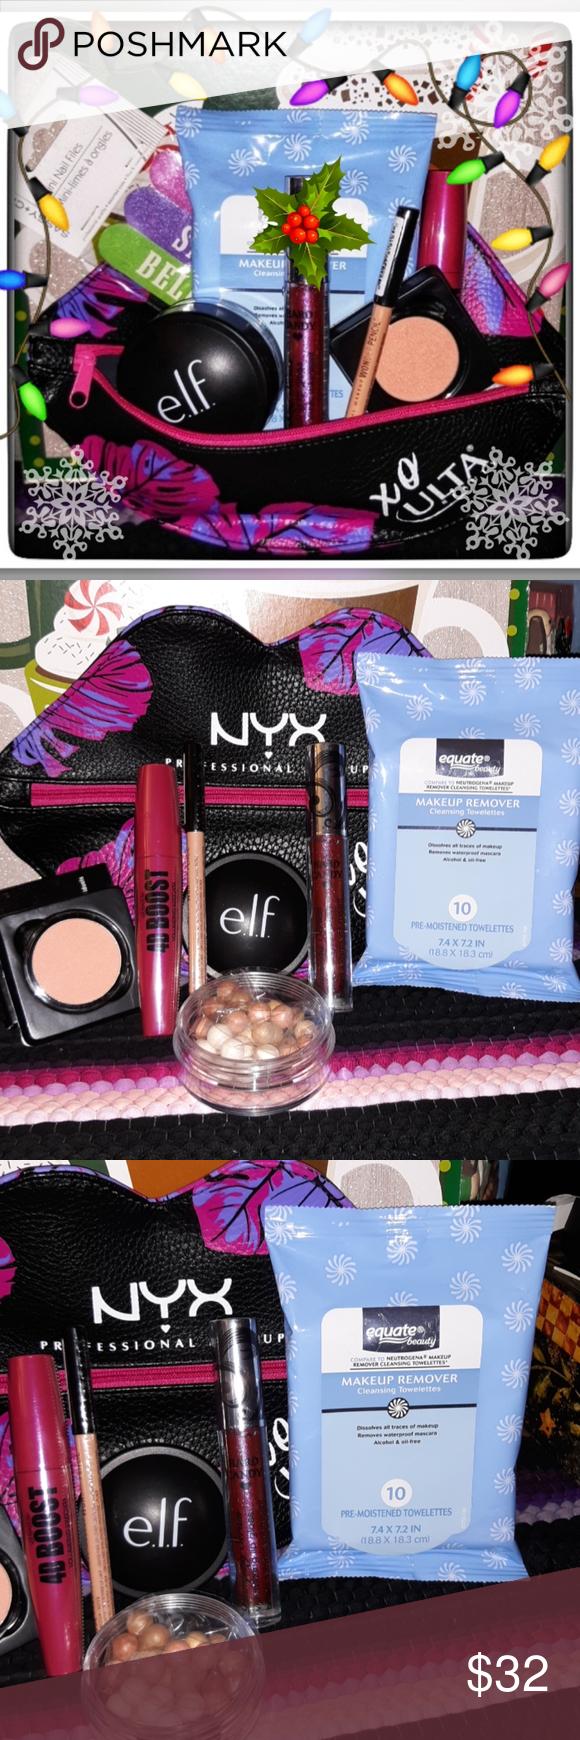 ️ 🐘 Holiday Beauty Bag 🐘 Holiday beauty, Beauty bag